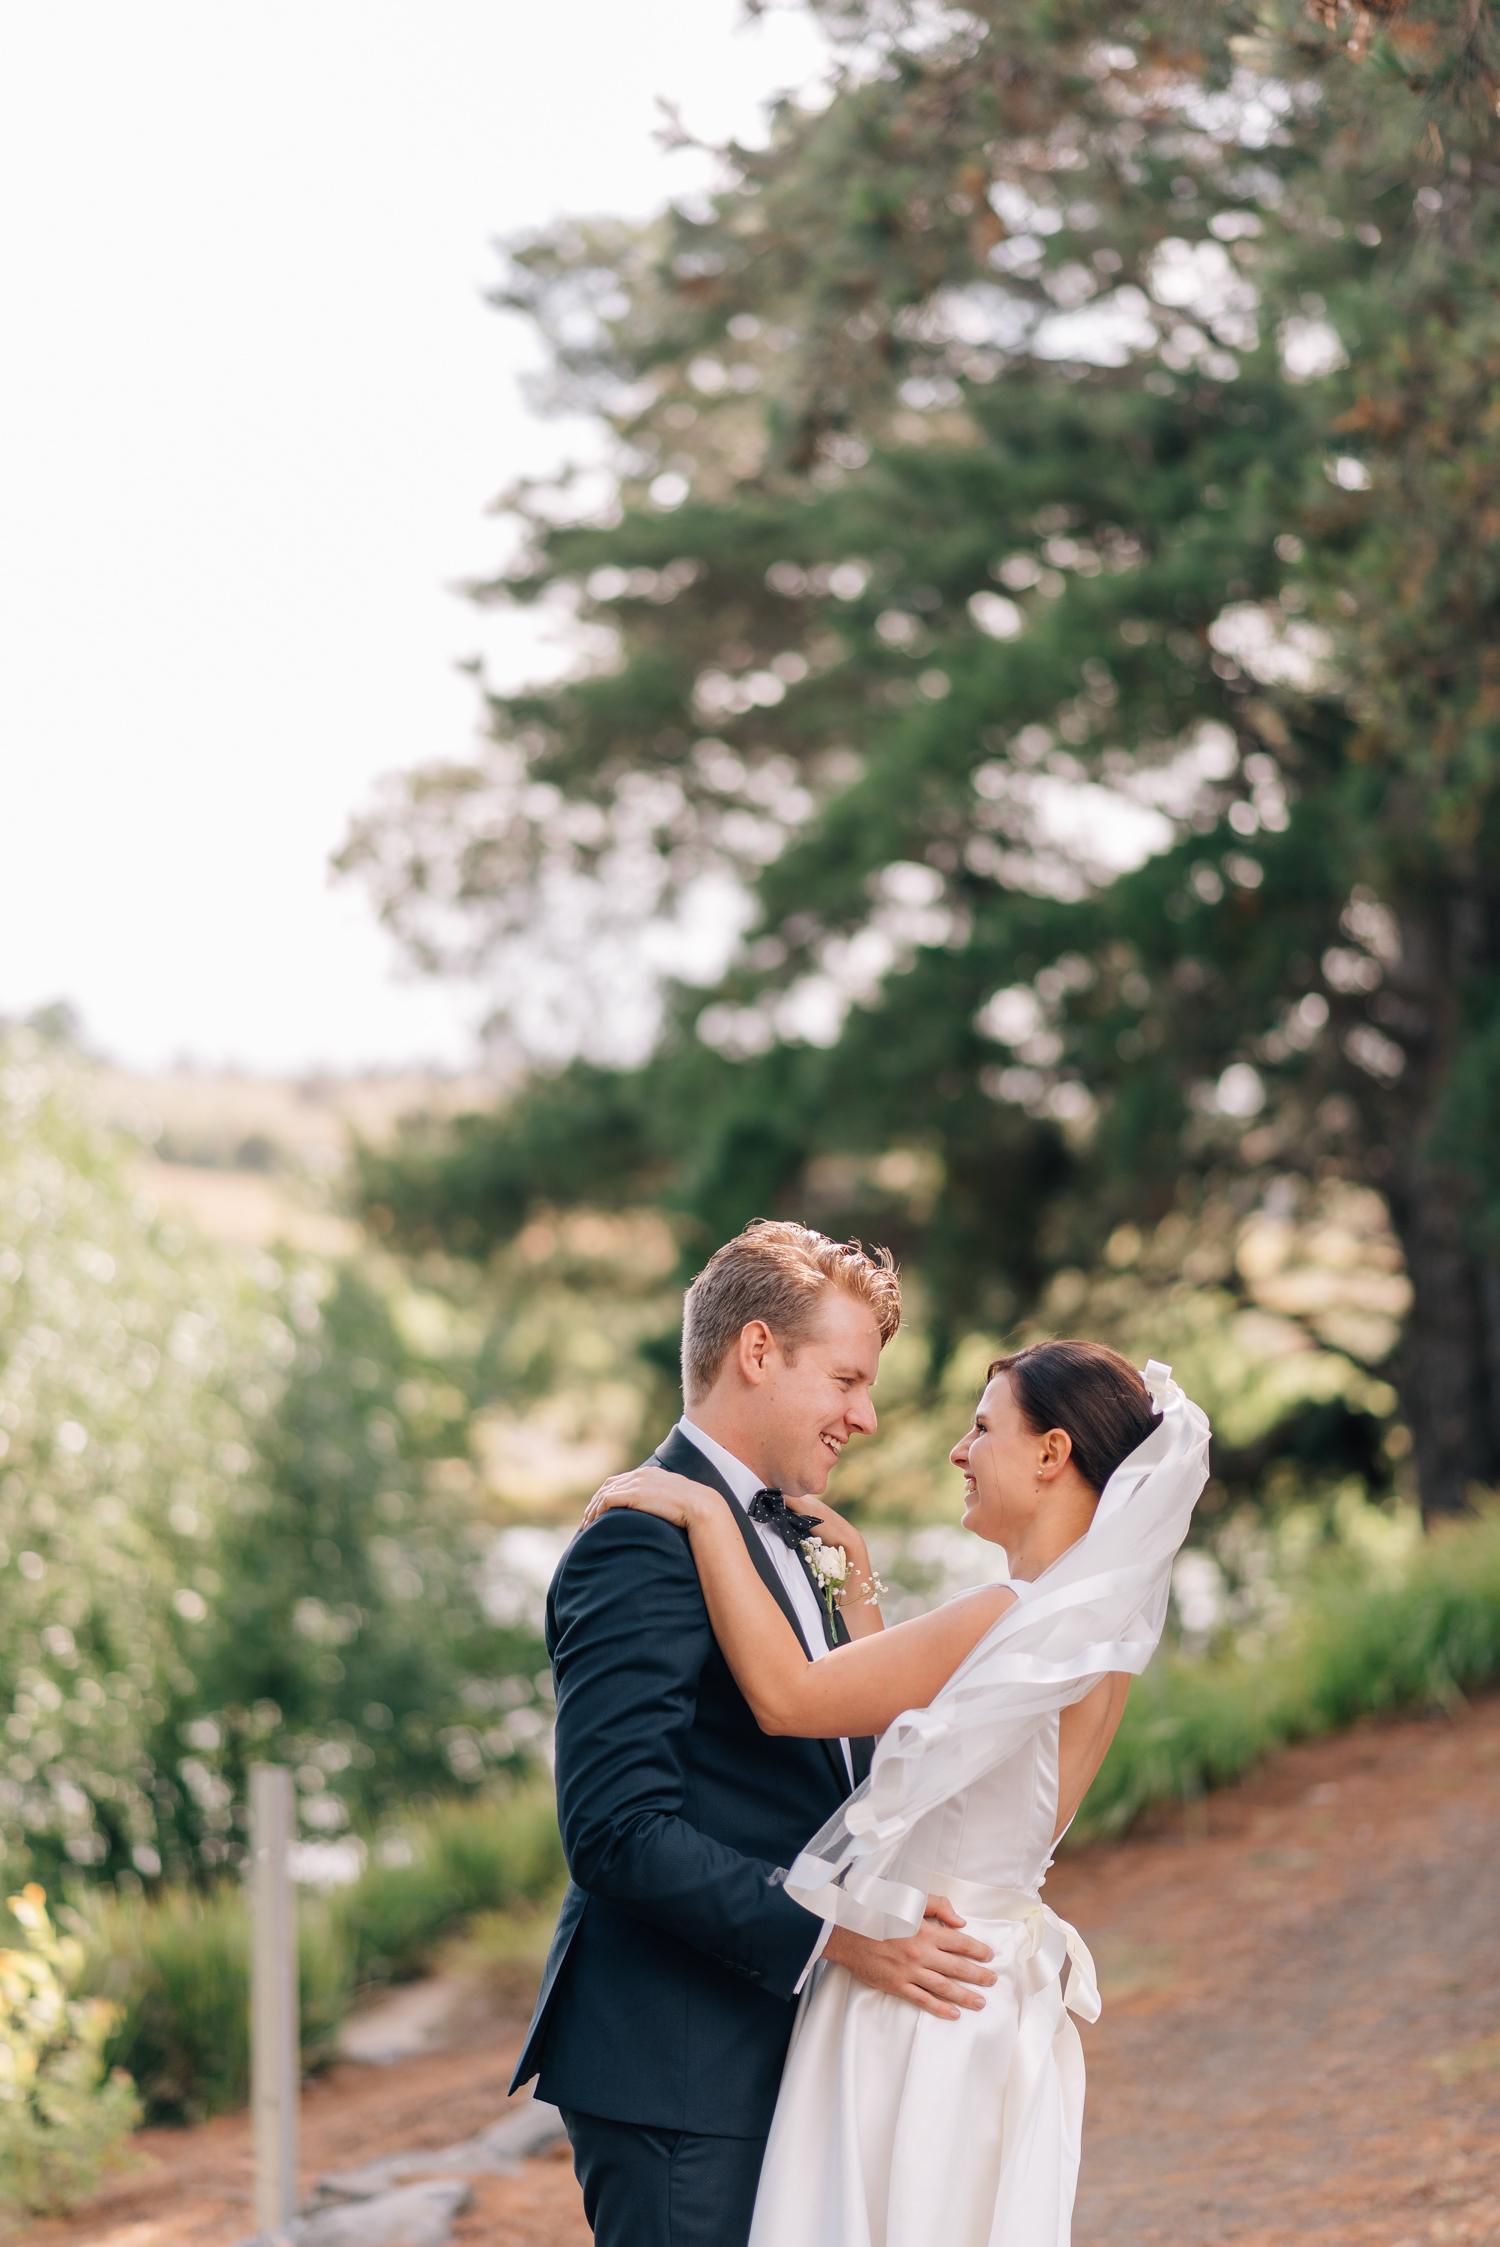 Josef-Chromy-Wedding-Photographer-55.jpg